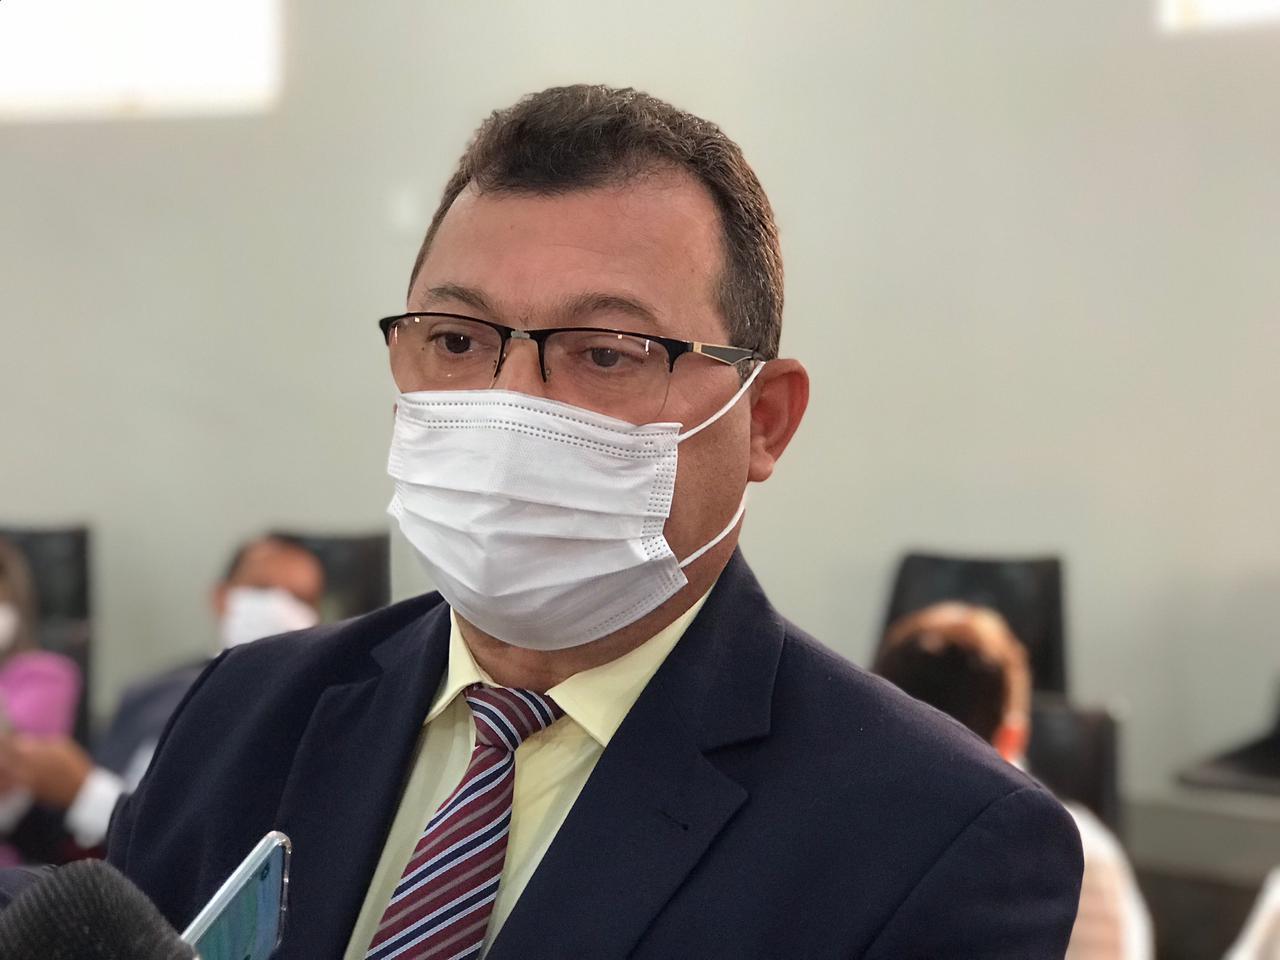 Presidente da Câmara de Picos segue internado após testar positivo para Covid-19